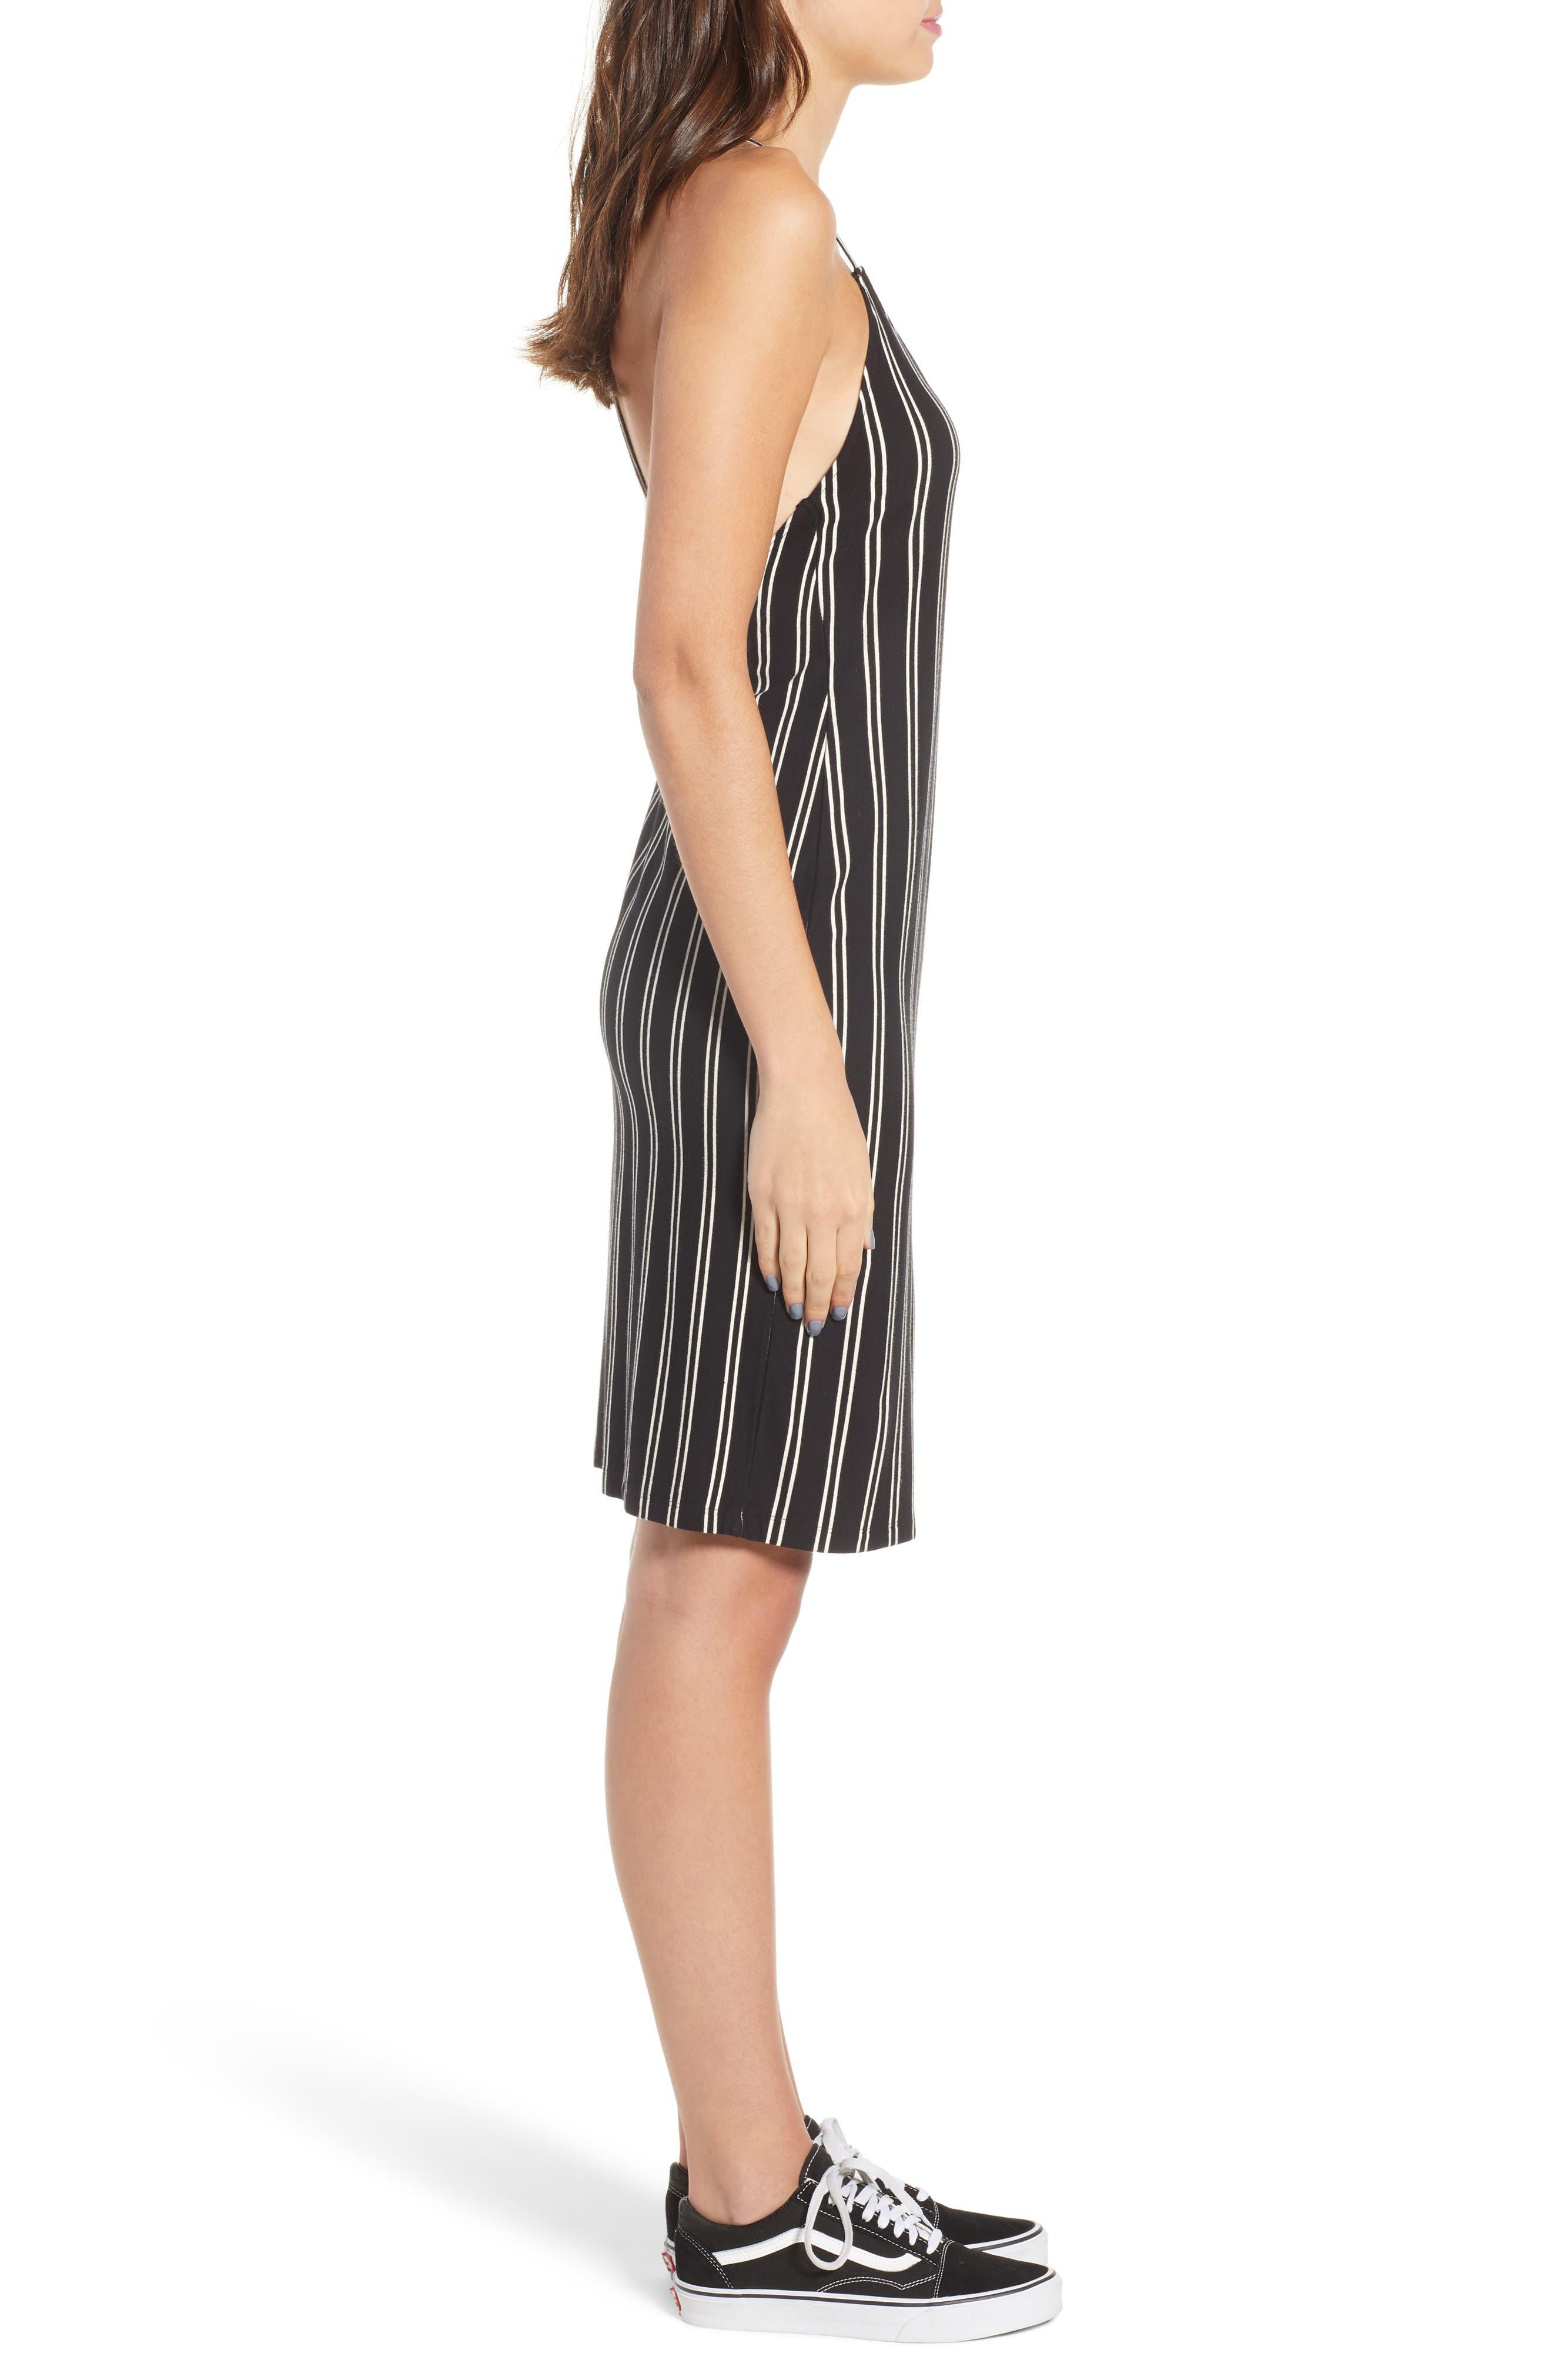 Lockette Strappy Striped Dress,                             Alternate thumbnail 3, color,                             005